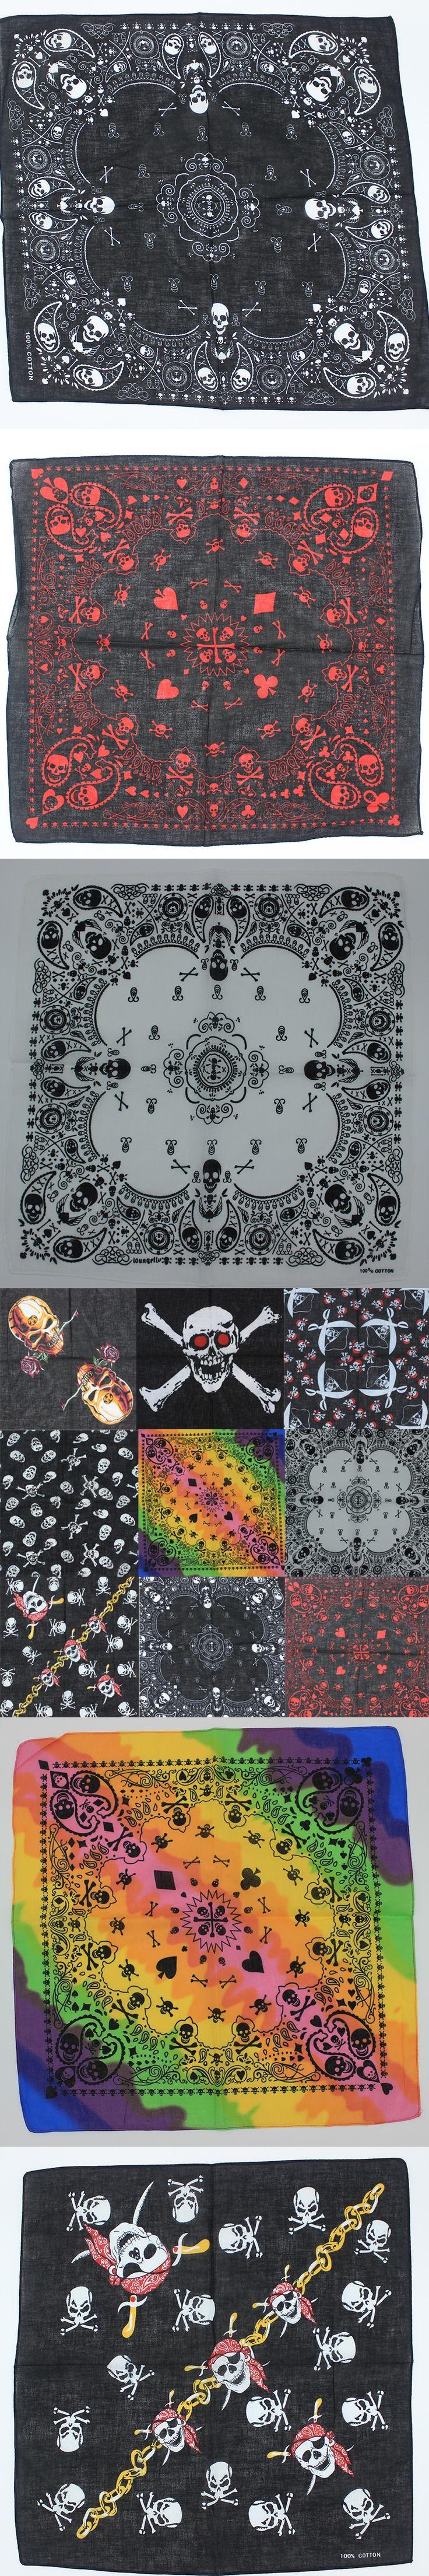 2017 New Design Fashion Hip Hop 100% Cotton Skull Bandana Square Scarf Black Paisley Bicycle Headband For Women/Men/Boys/Girls